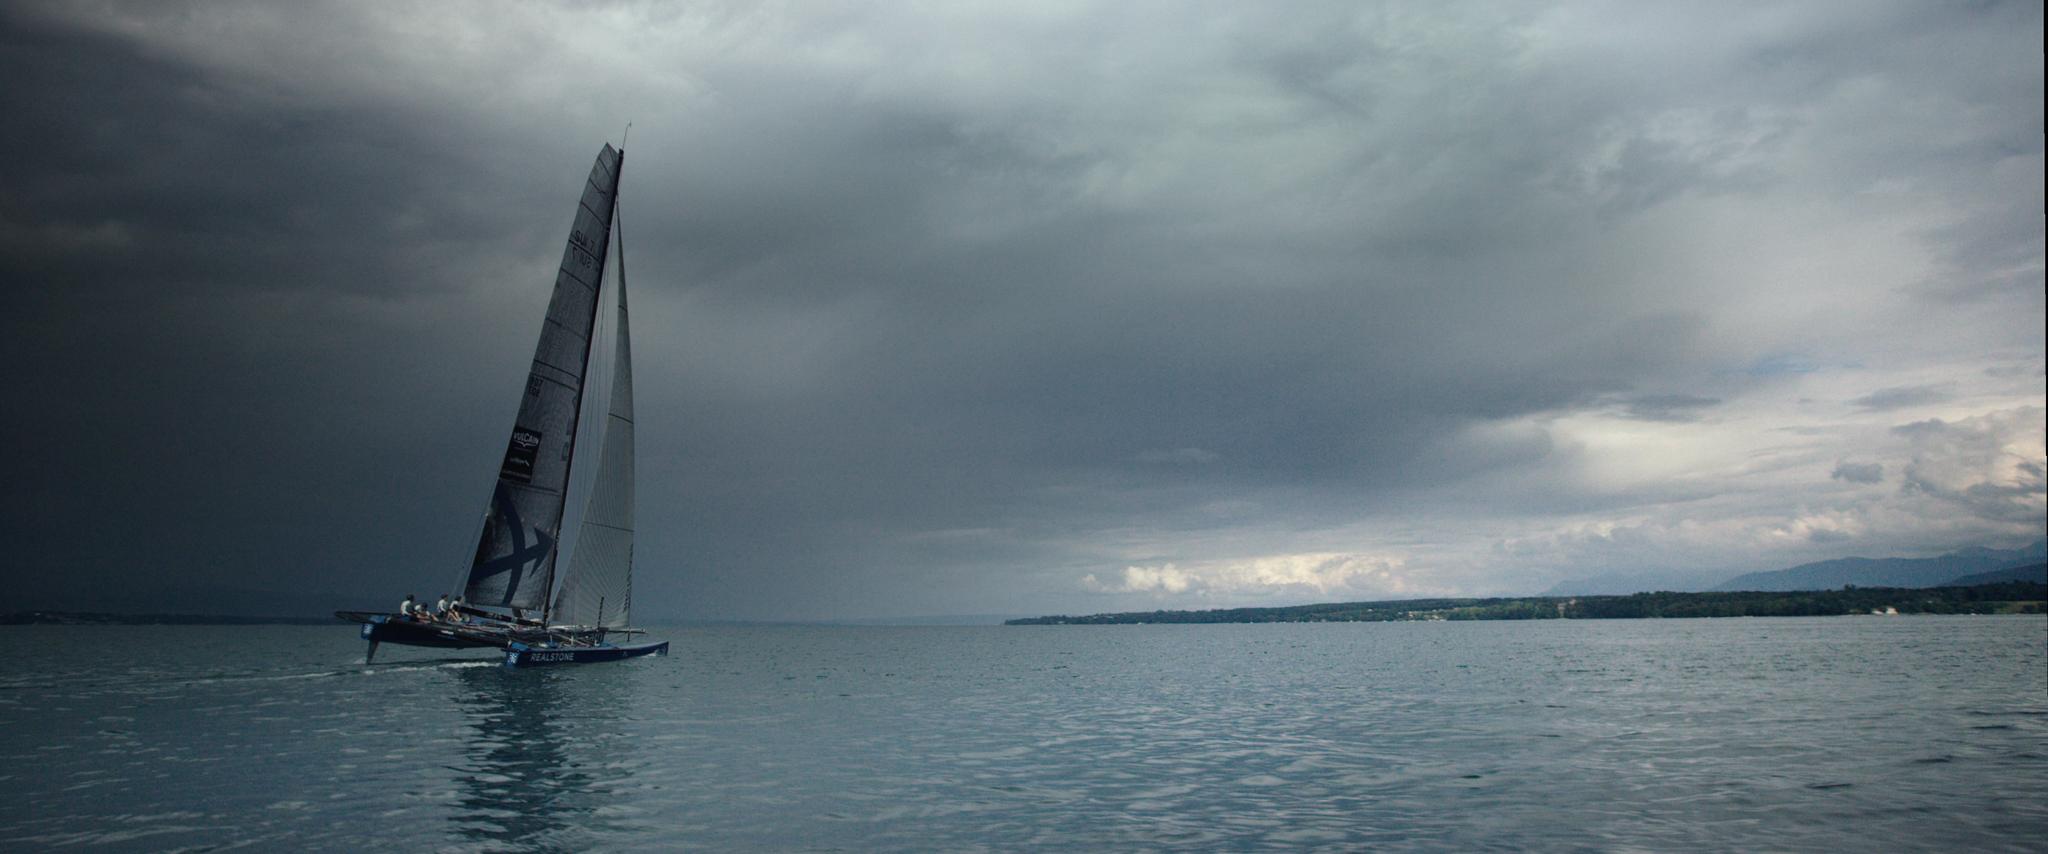 RUAG_Sailing_Web-13